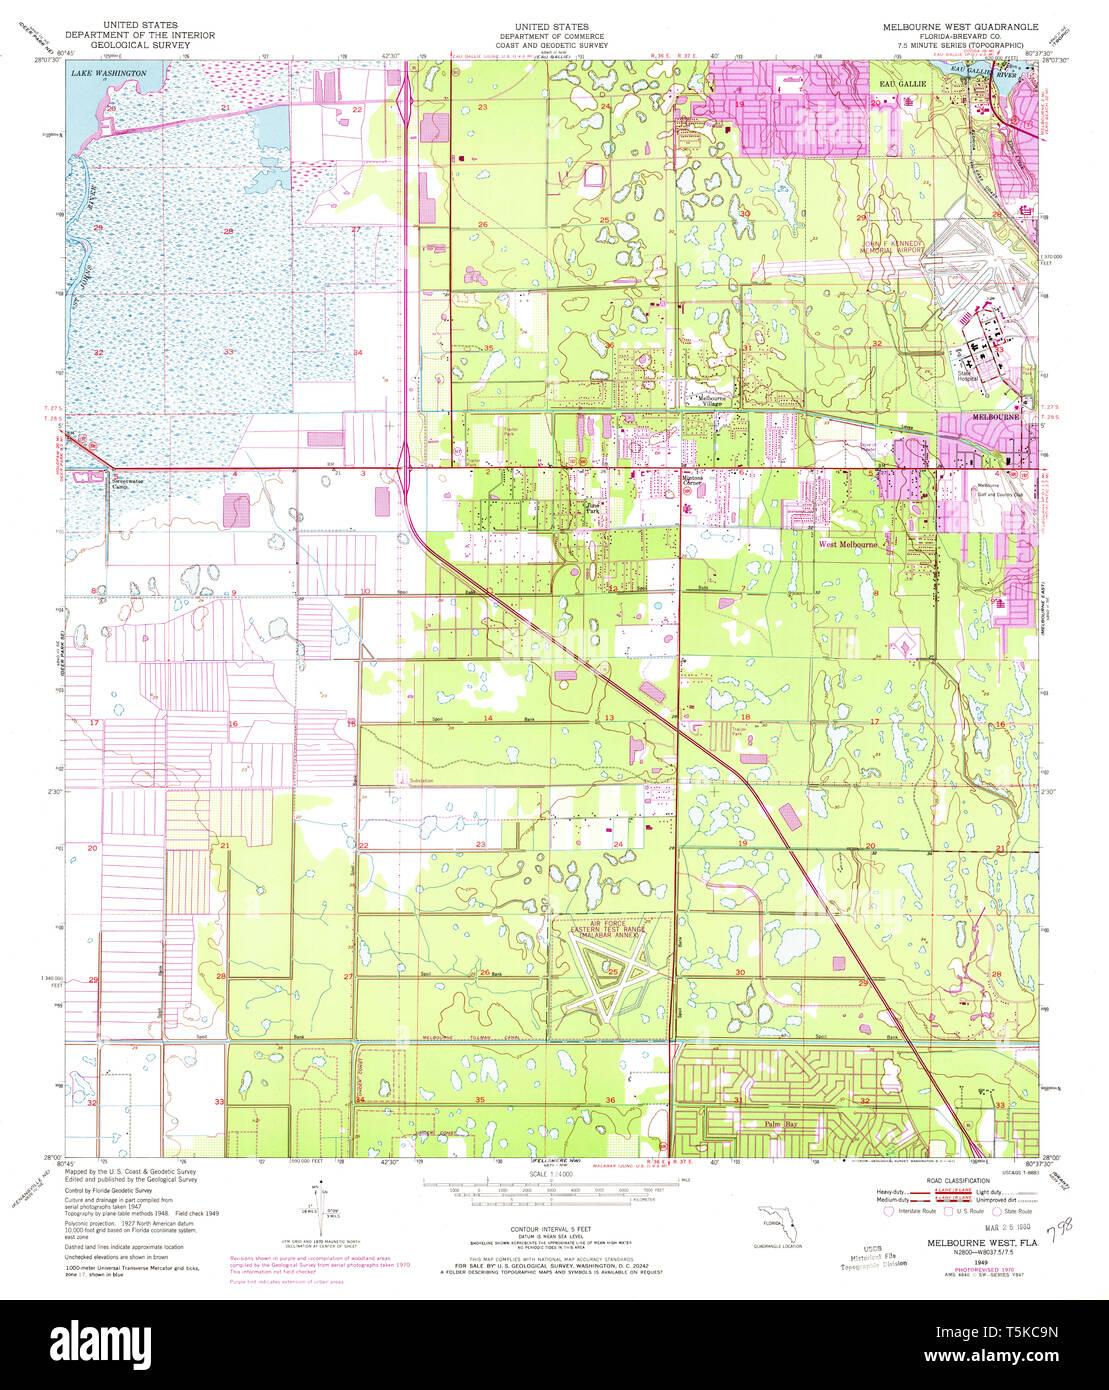 Map Of Florida Melbourne.Usgs Topo Map Florida Fl Melbourne West 347447 1949 24000